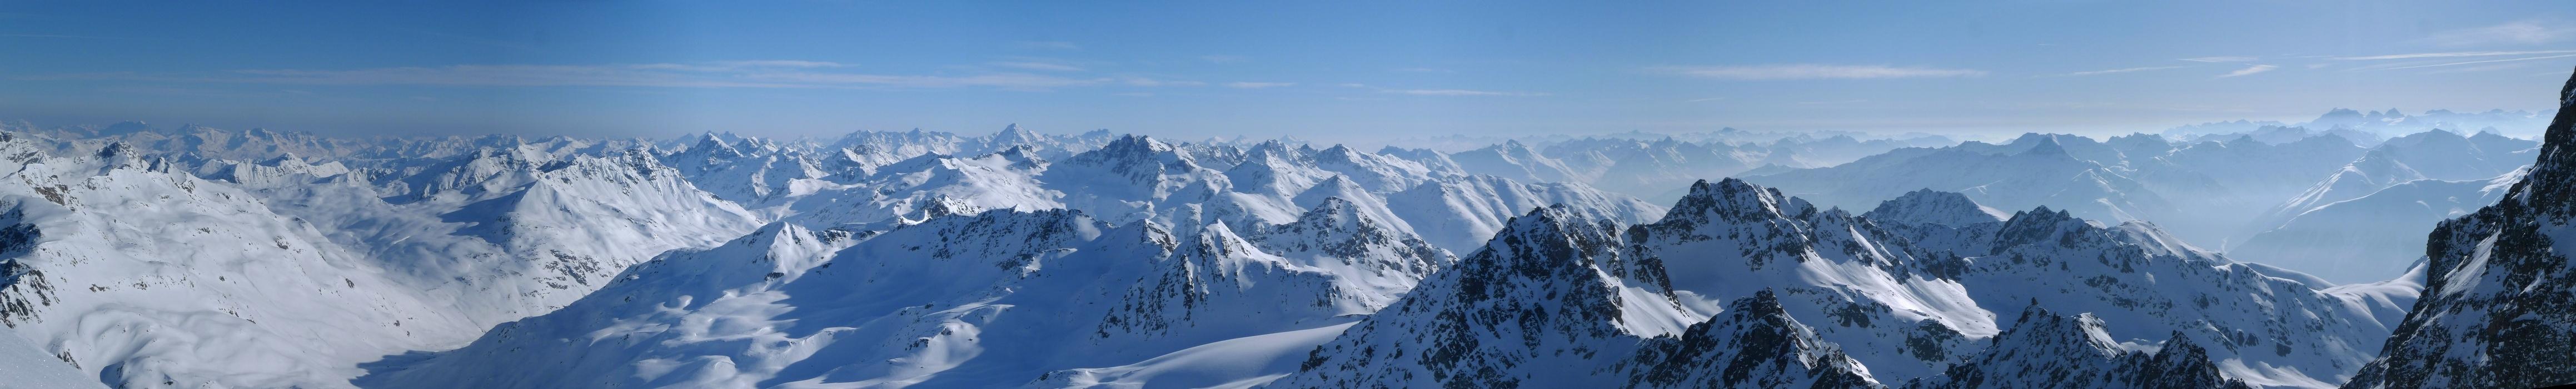 Piz Kesch - Chamanna Kesch Albula Alpen Švýcarsko panorama 39